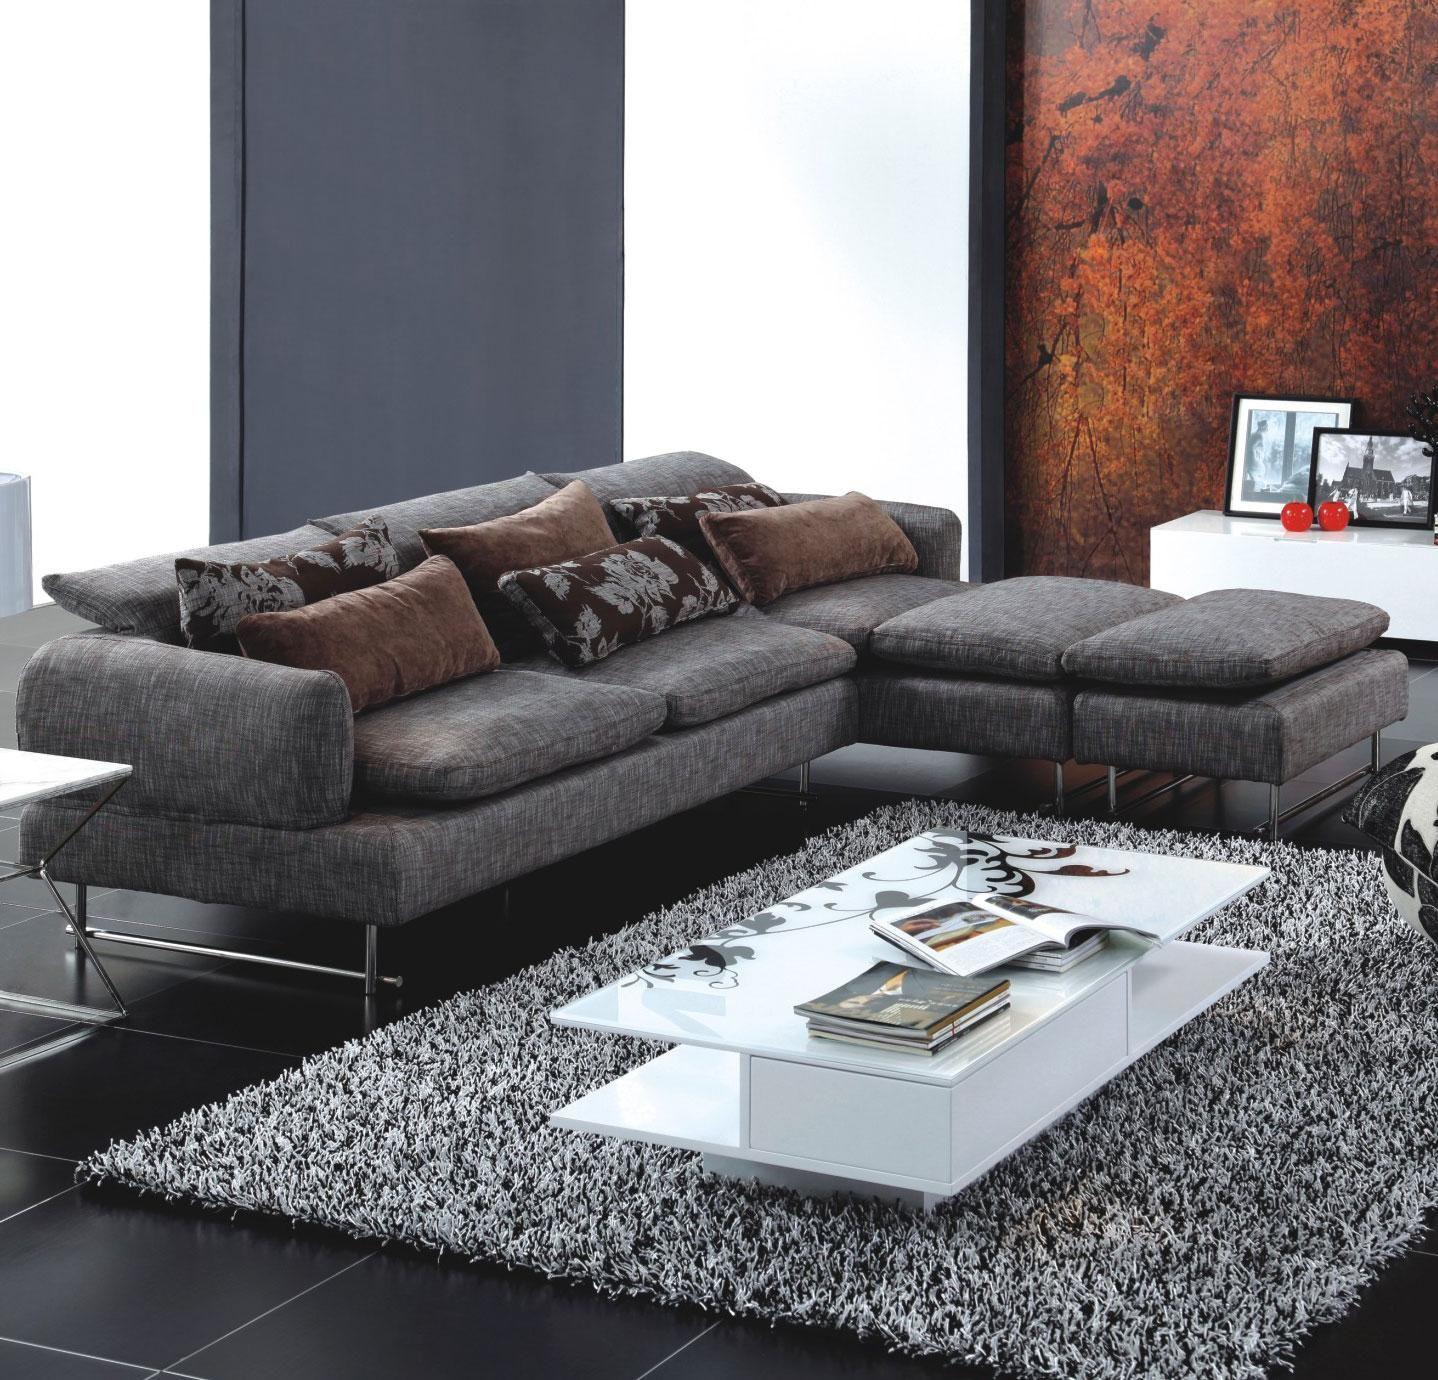 Tosh Furniture Zebrano Fabric Sectional Sofa Modern Furniture